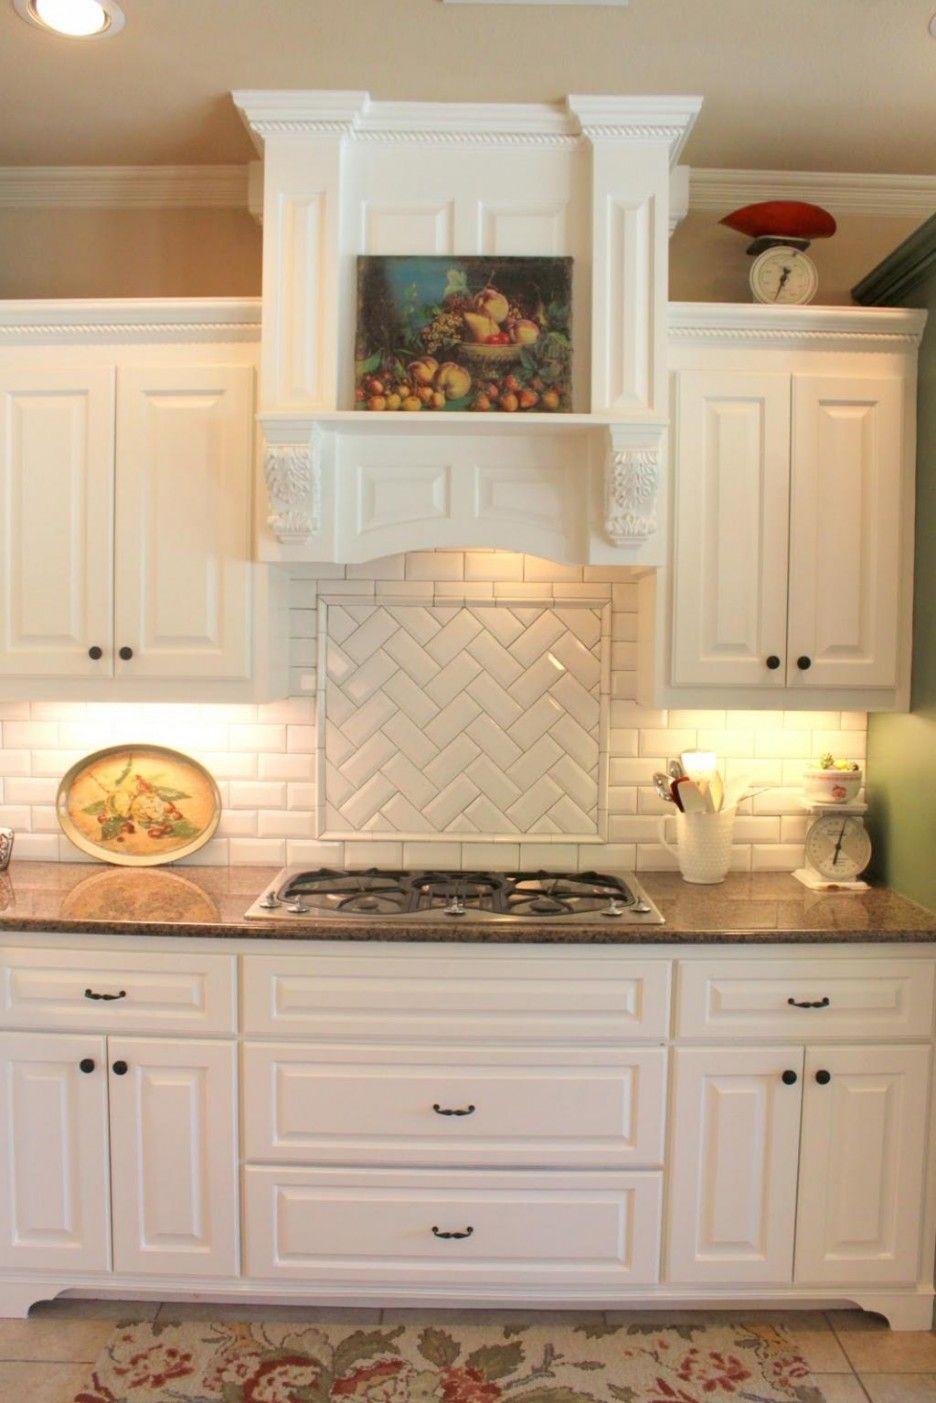 Adorable White Color Subway Tile Kitchen Backsplash With ...